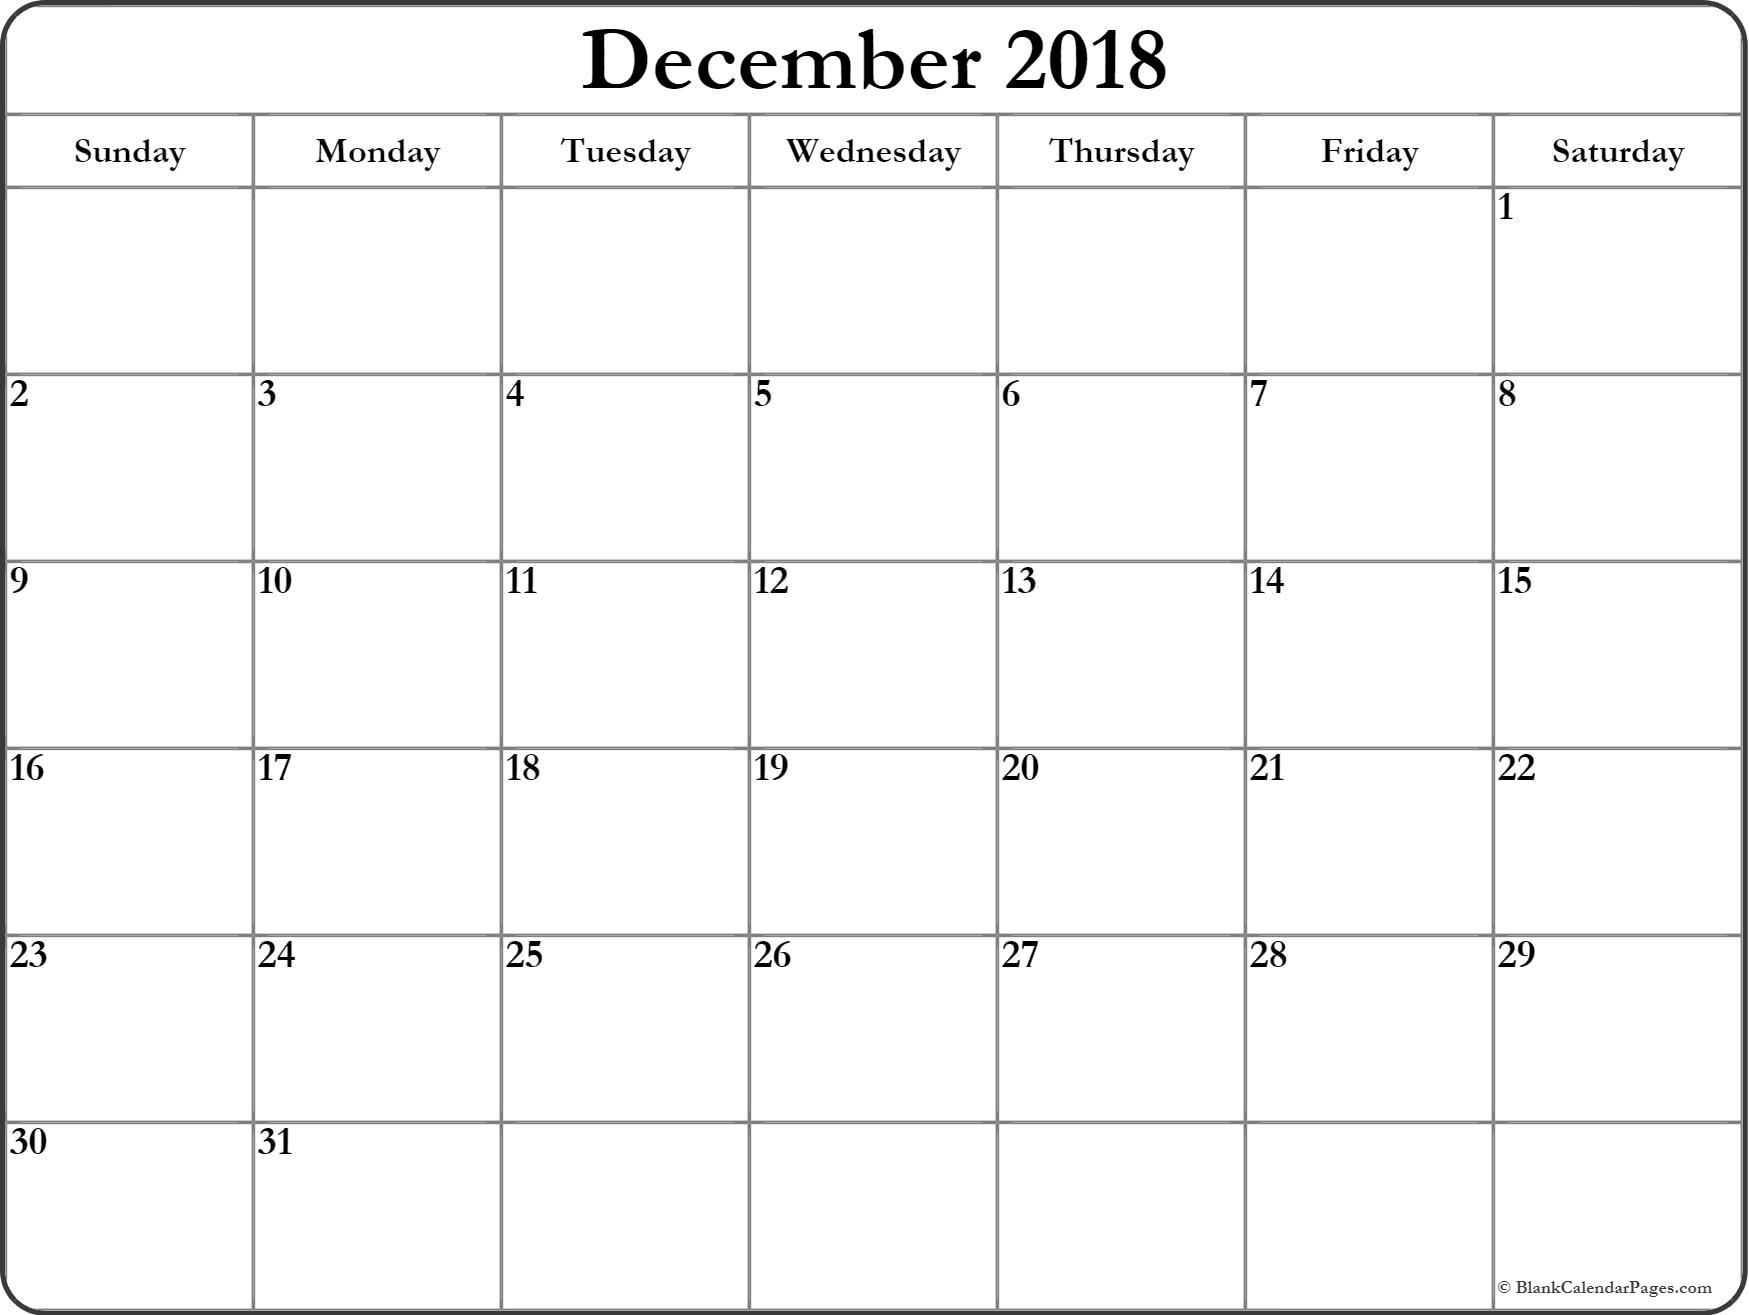 December 2018 Calendar | Free Printable Monthly Calendars regarding Blank Calendars December Printable